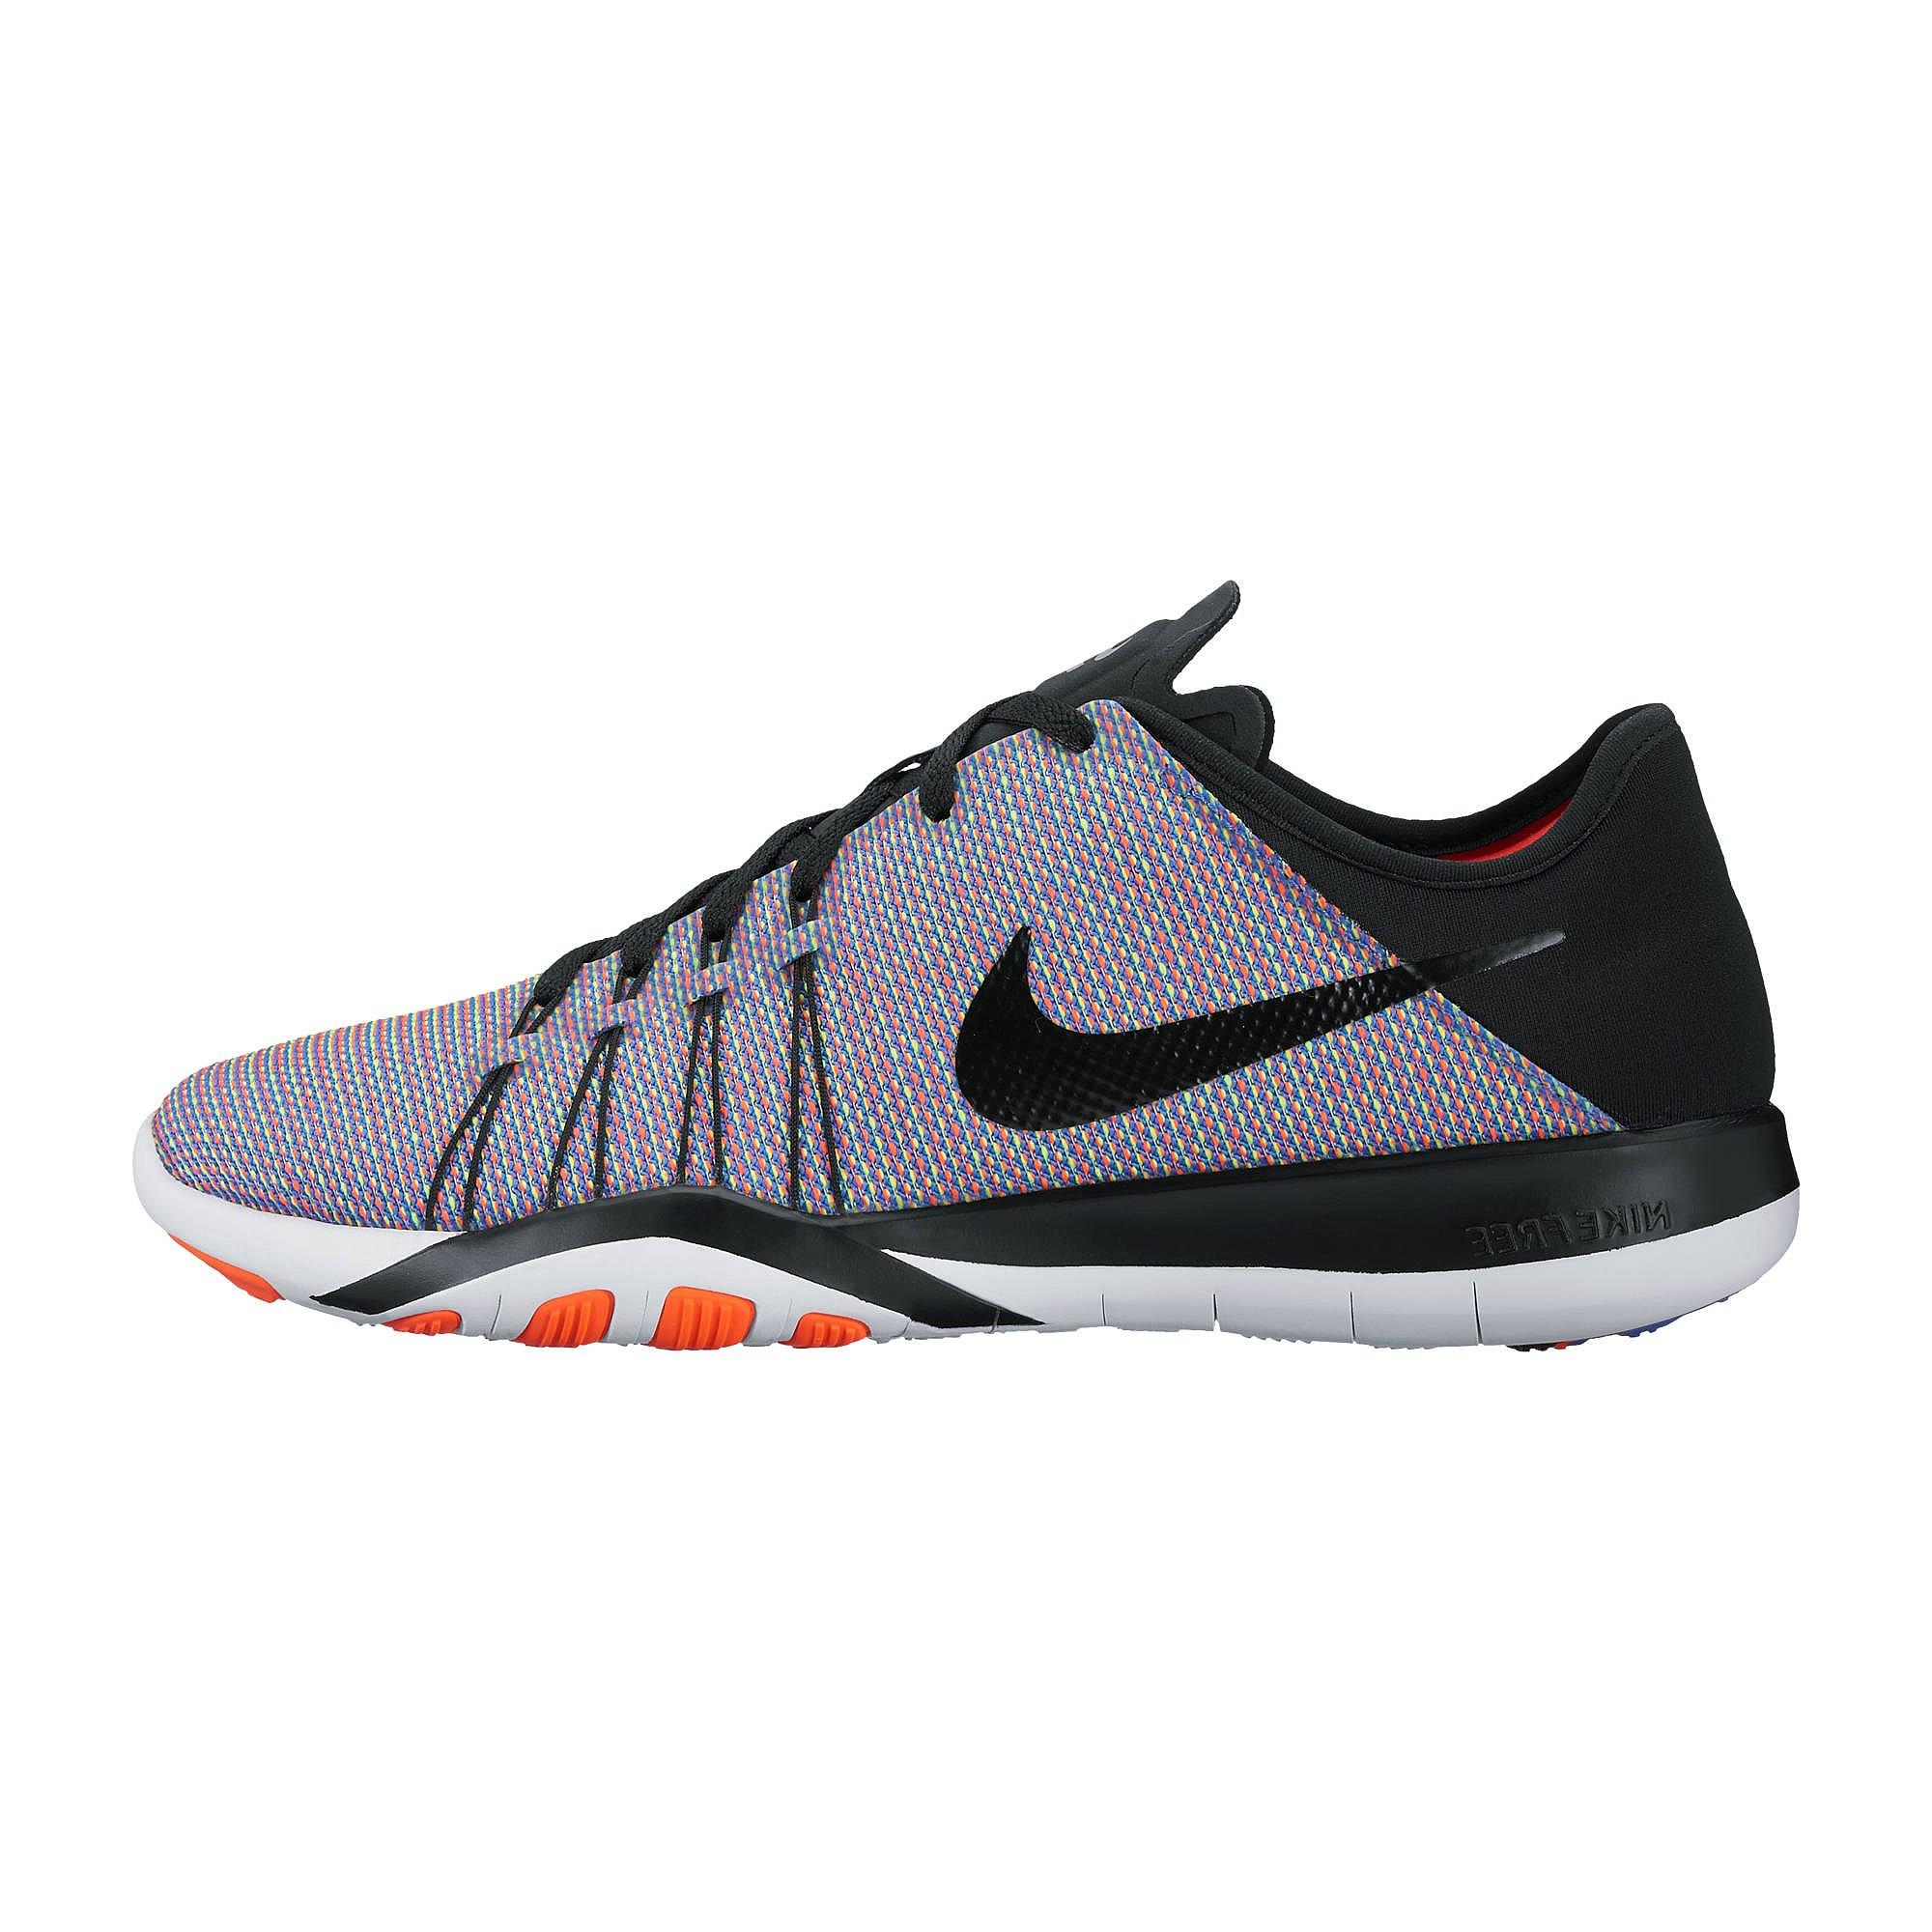 sale retailer ca200 2565a Galleon - Nike Womens Free Tr 6 Training Shoes, Multicolor, Size 6.0 Vl4y